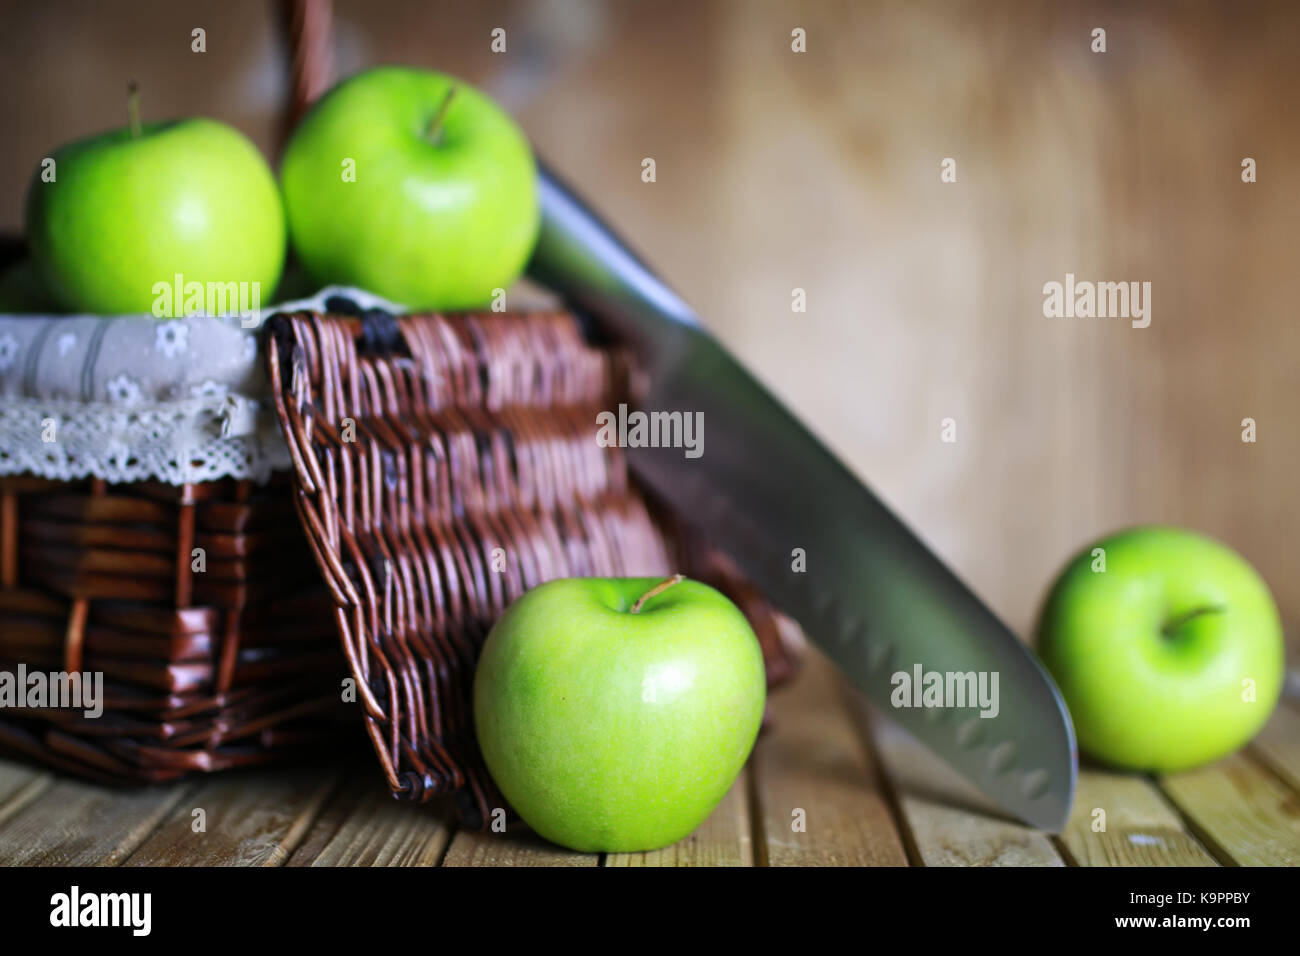 Manzana Verde en una cesta Imagen De Stock